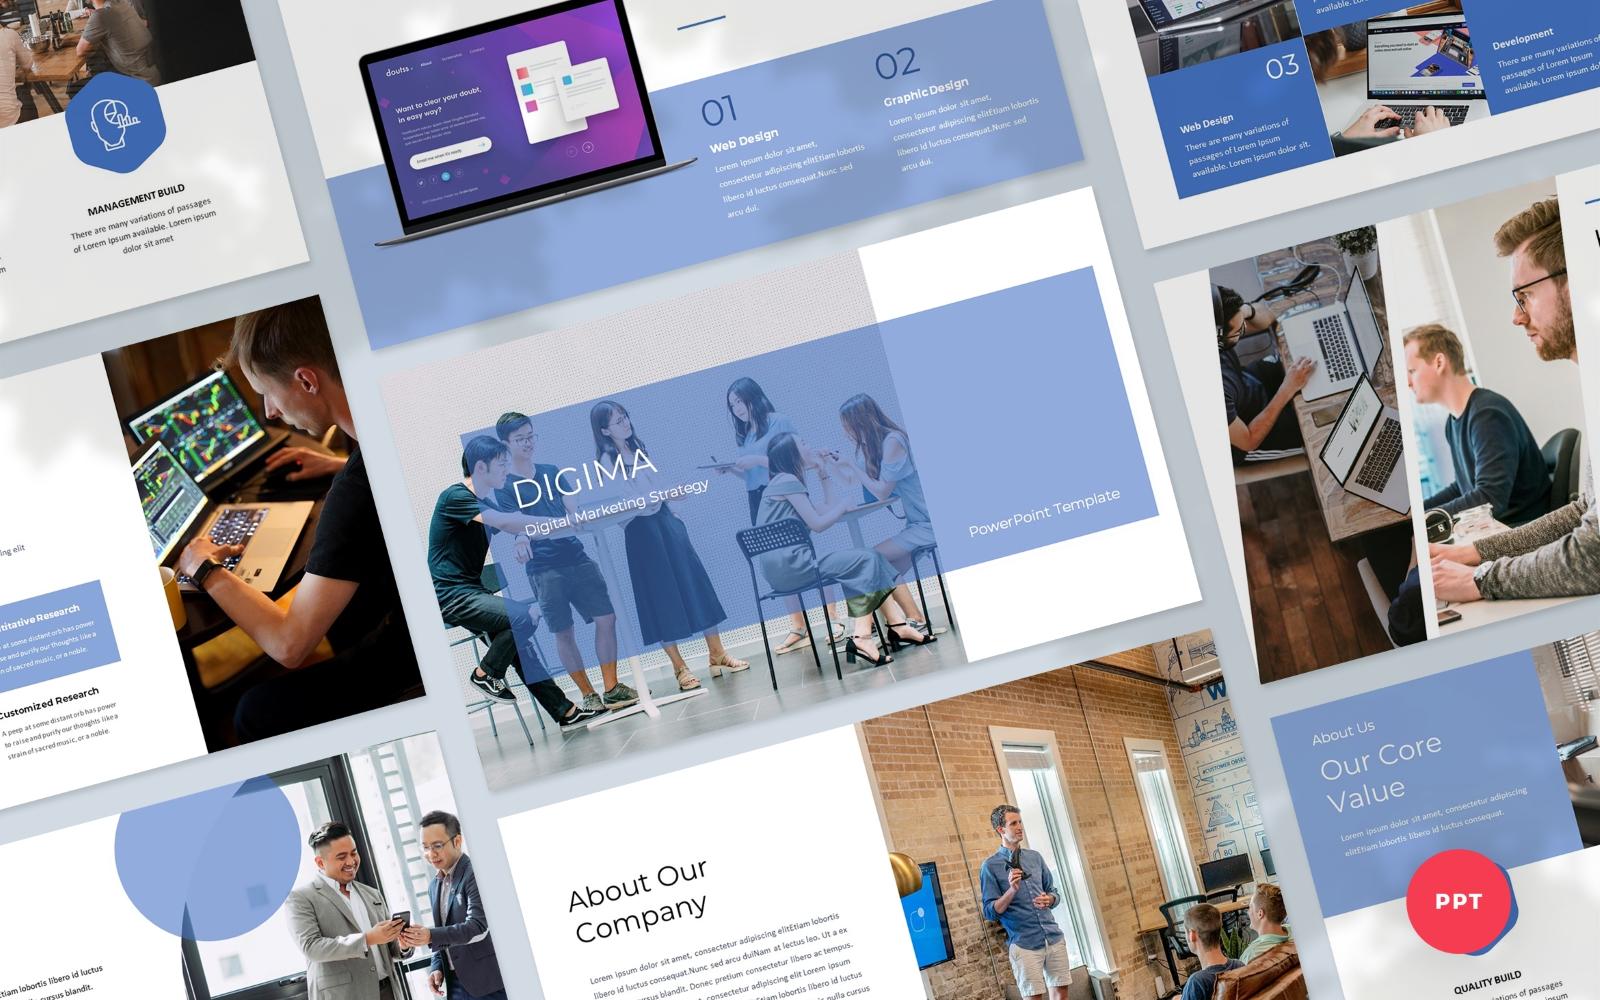 Digima - Digital Marketing PowerPoint Presentation Template